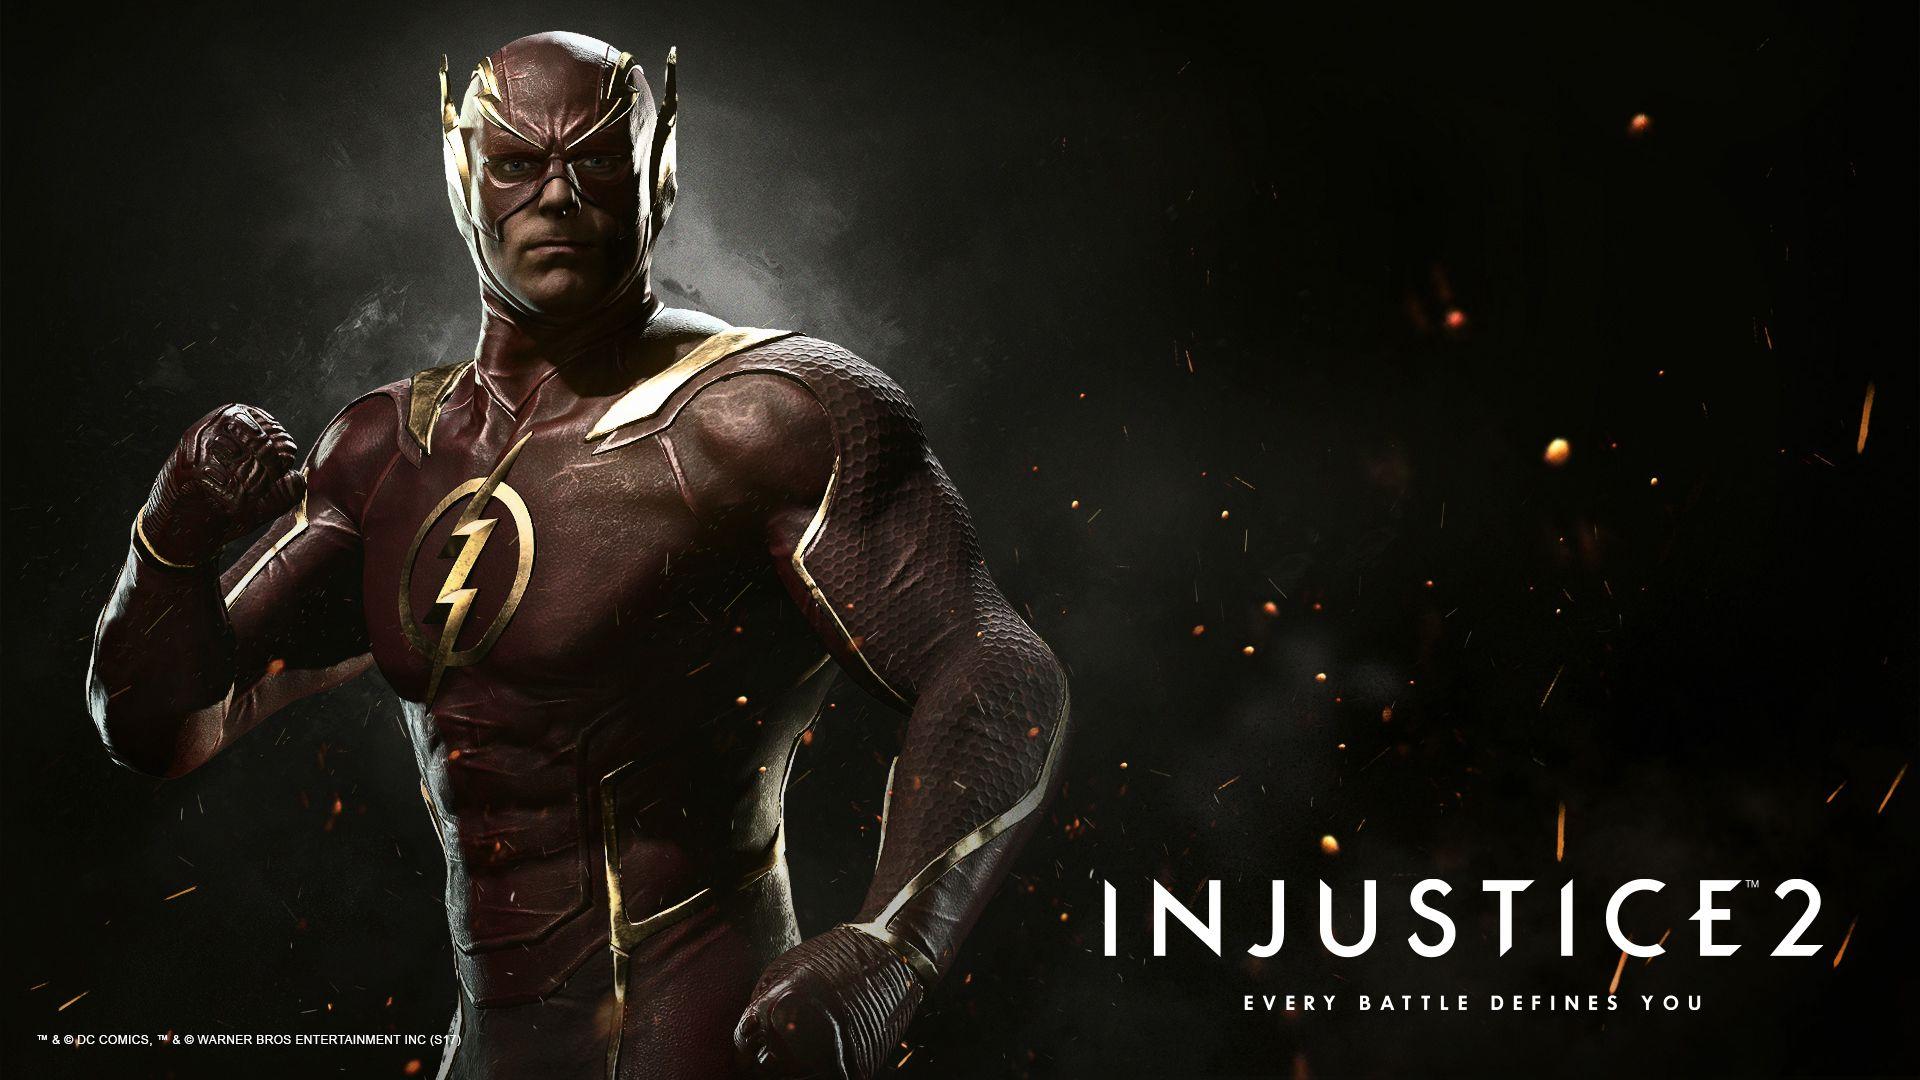 Barry Allen Injustica O Regime Wiki Dc Comics Fandom